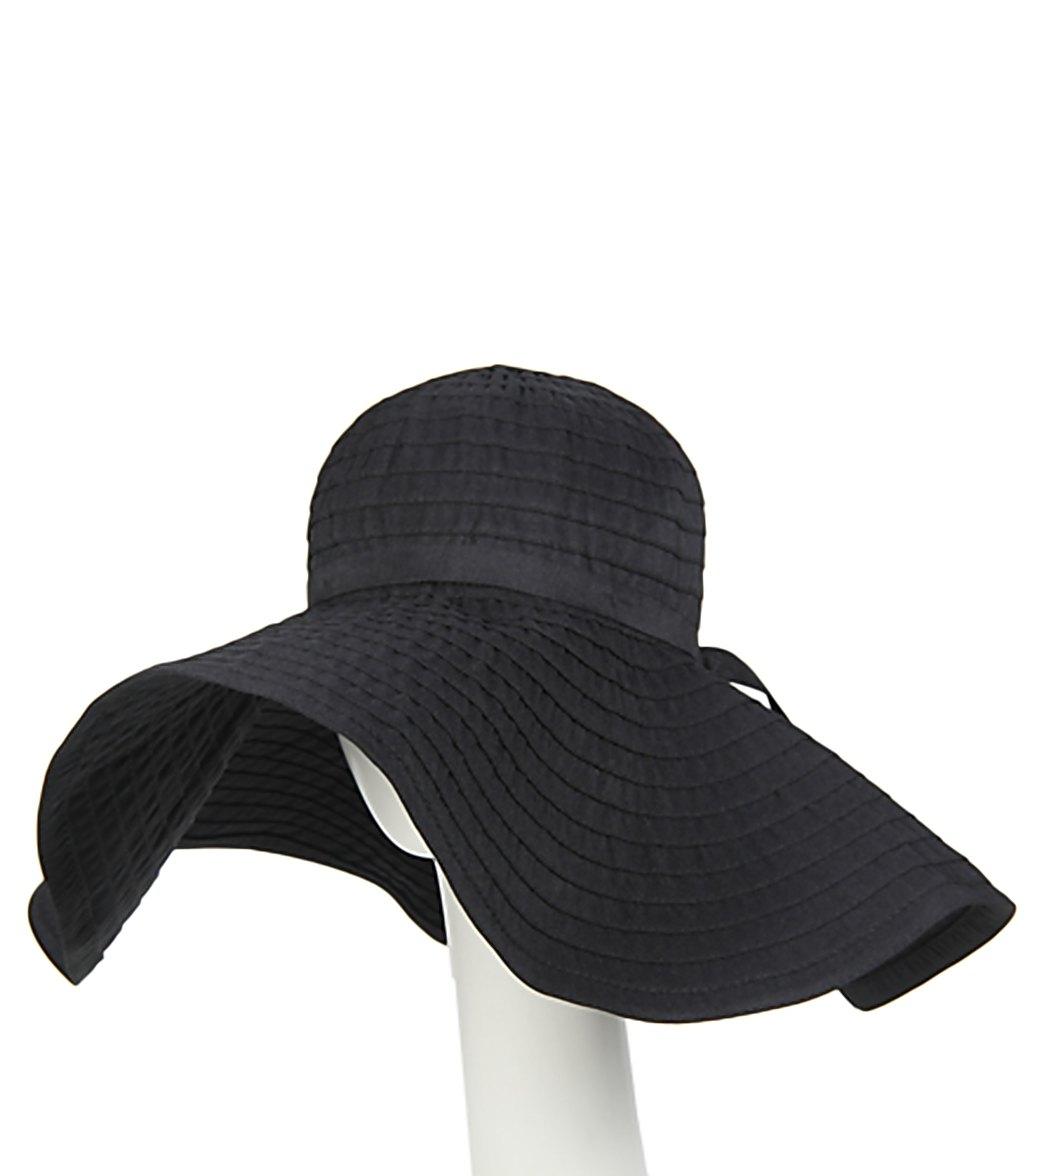 NEW LARGE BRIM Ribbon SunHat---Summer Hat----Cruise Sunhat....blackwhite color....